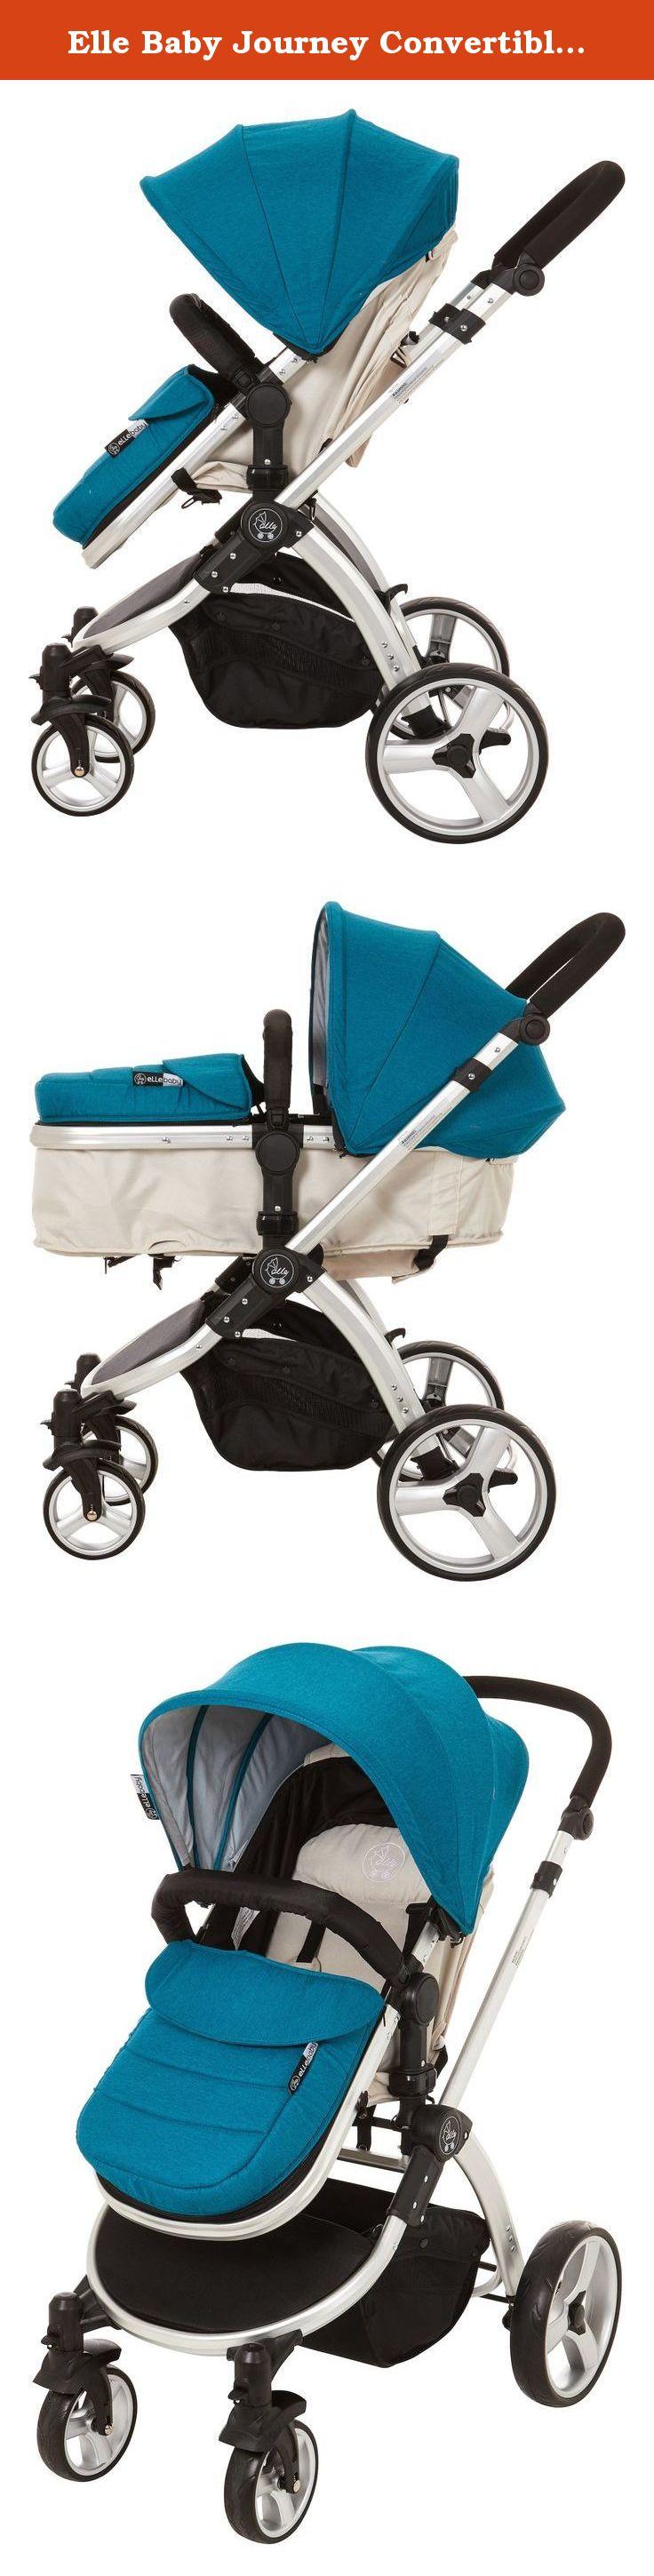 Elle Baby Journey Convertible Stroller, Teal. The Elle